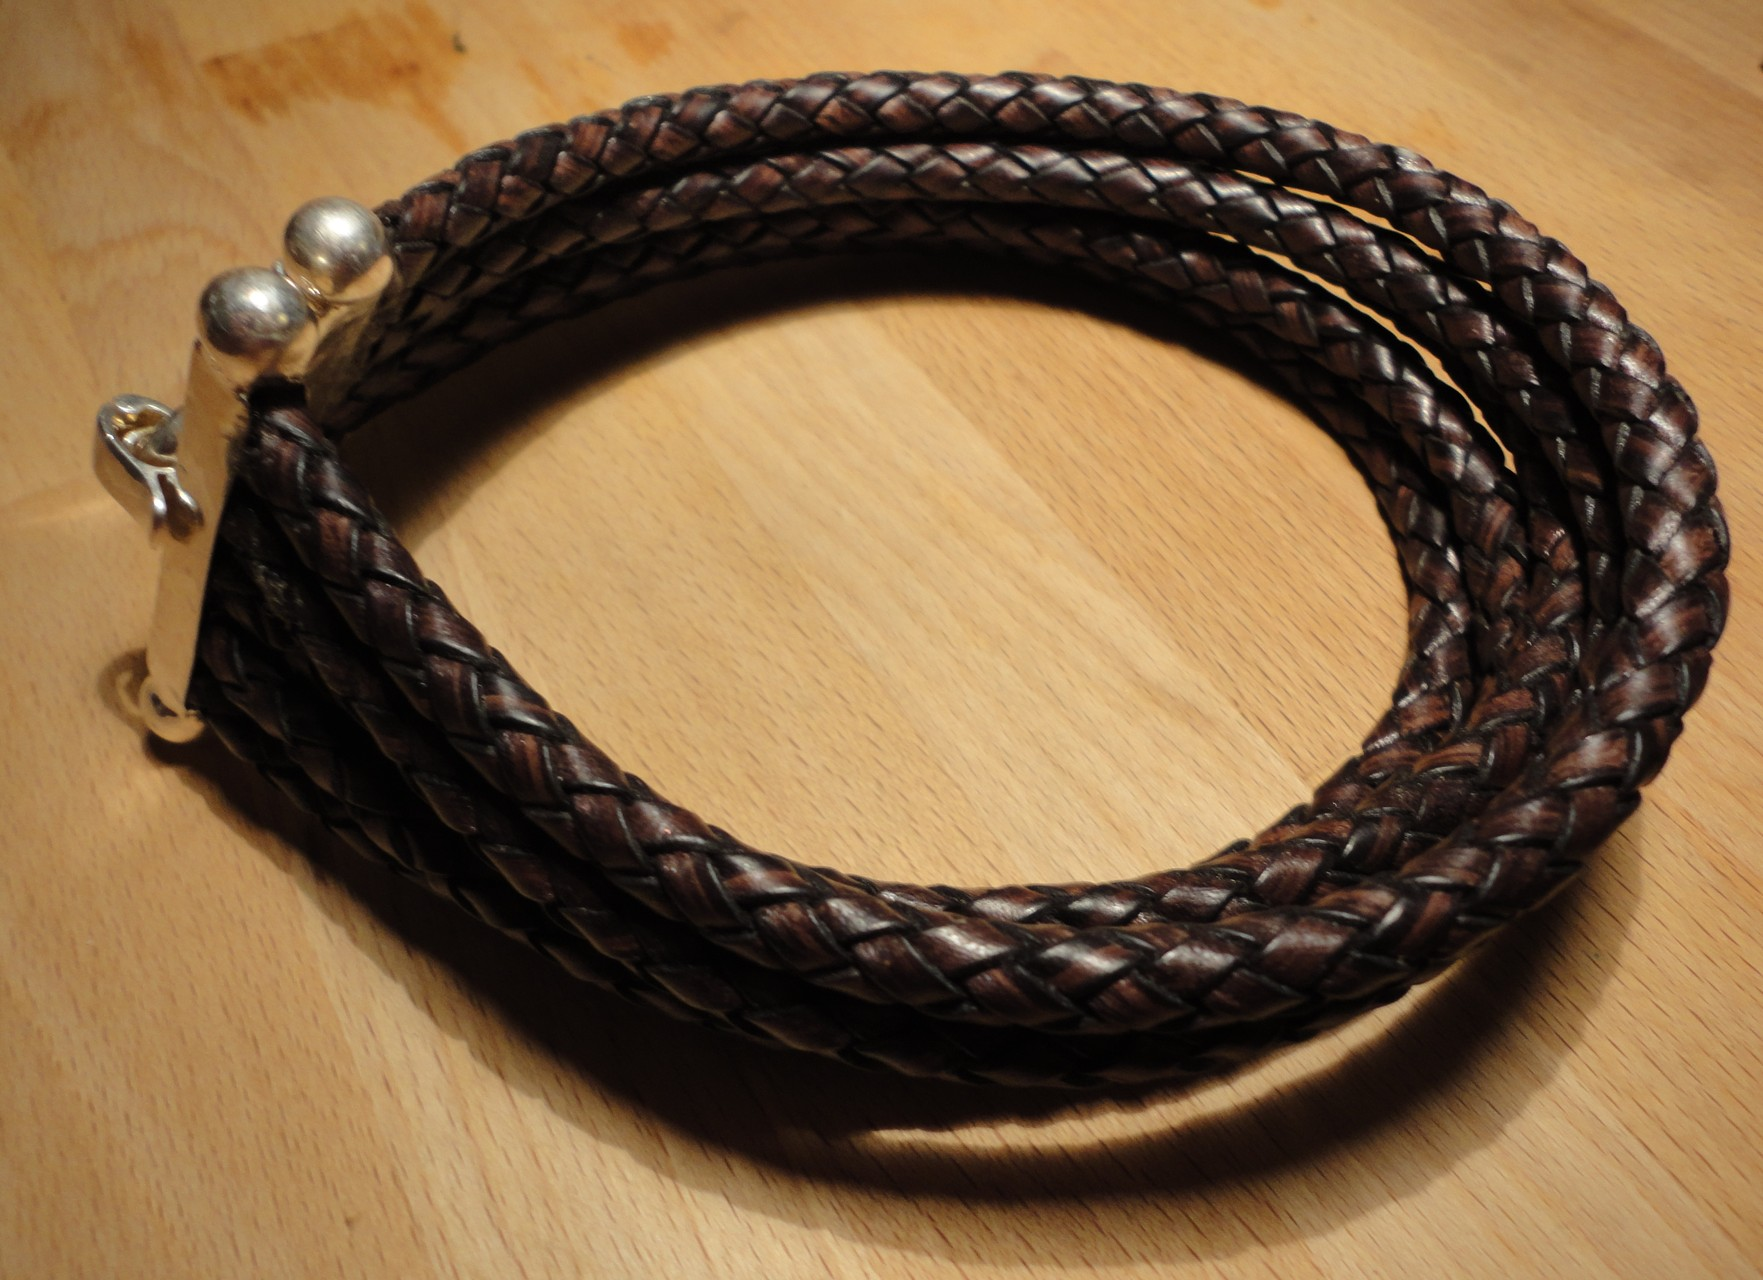 Lederhalsband mit edlem Silberverschluss (925 Sterlingsilber) Preis: CHF 180.-